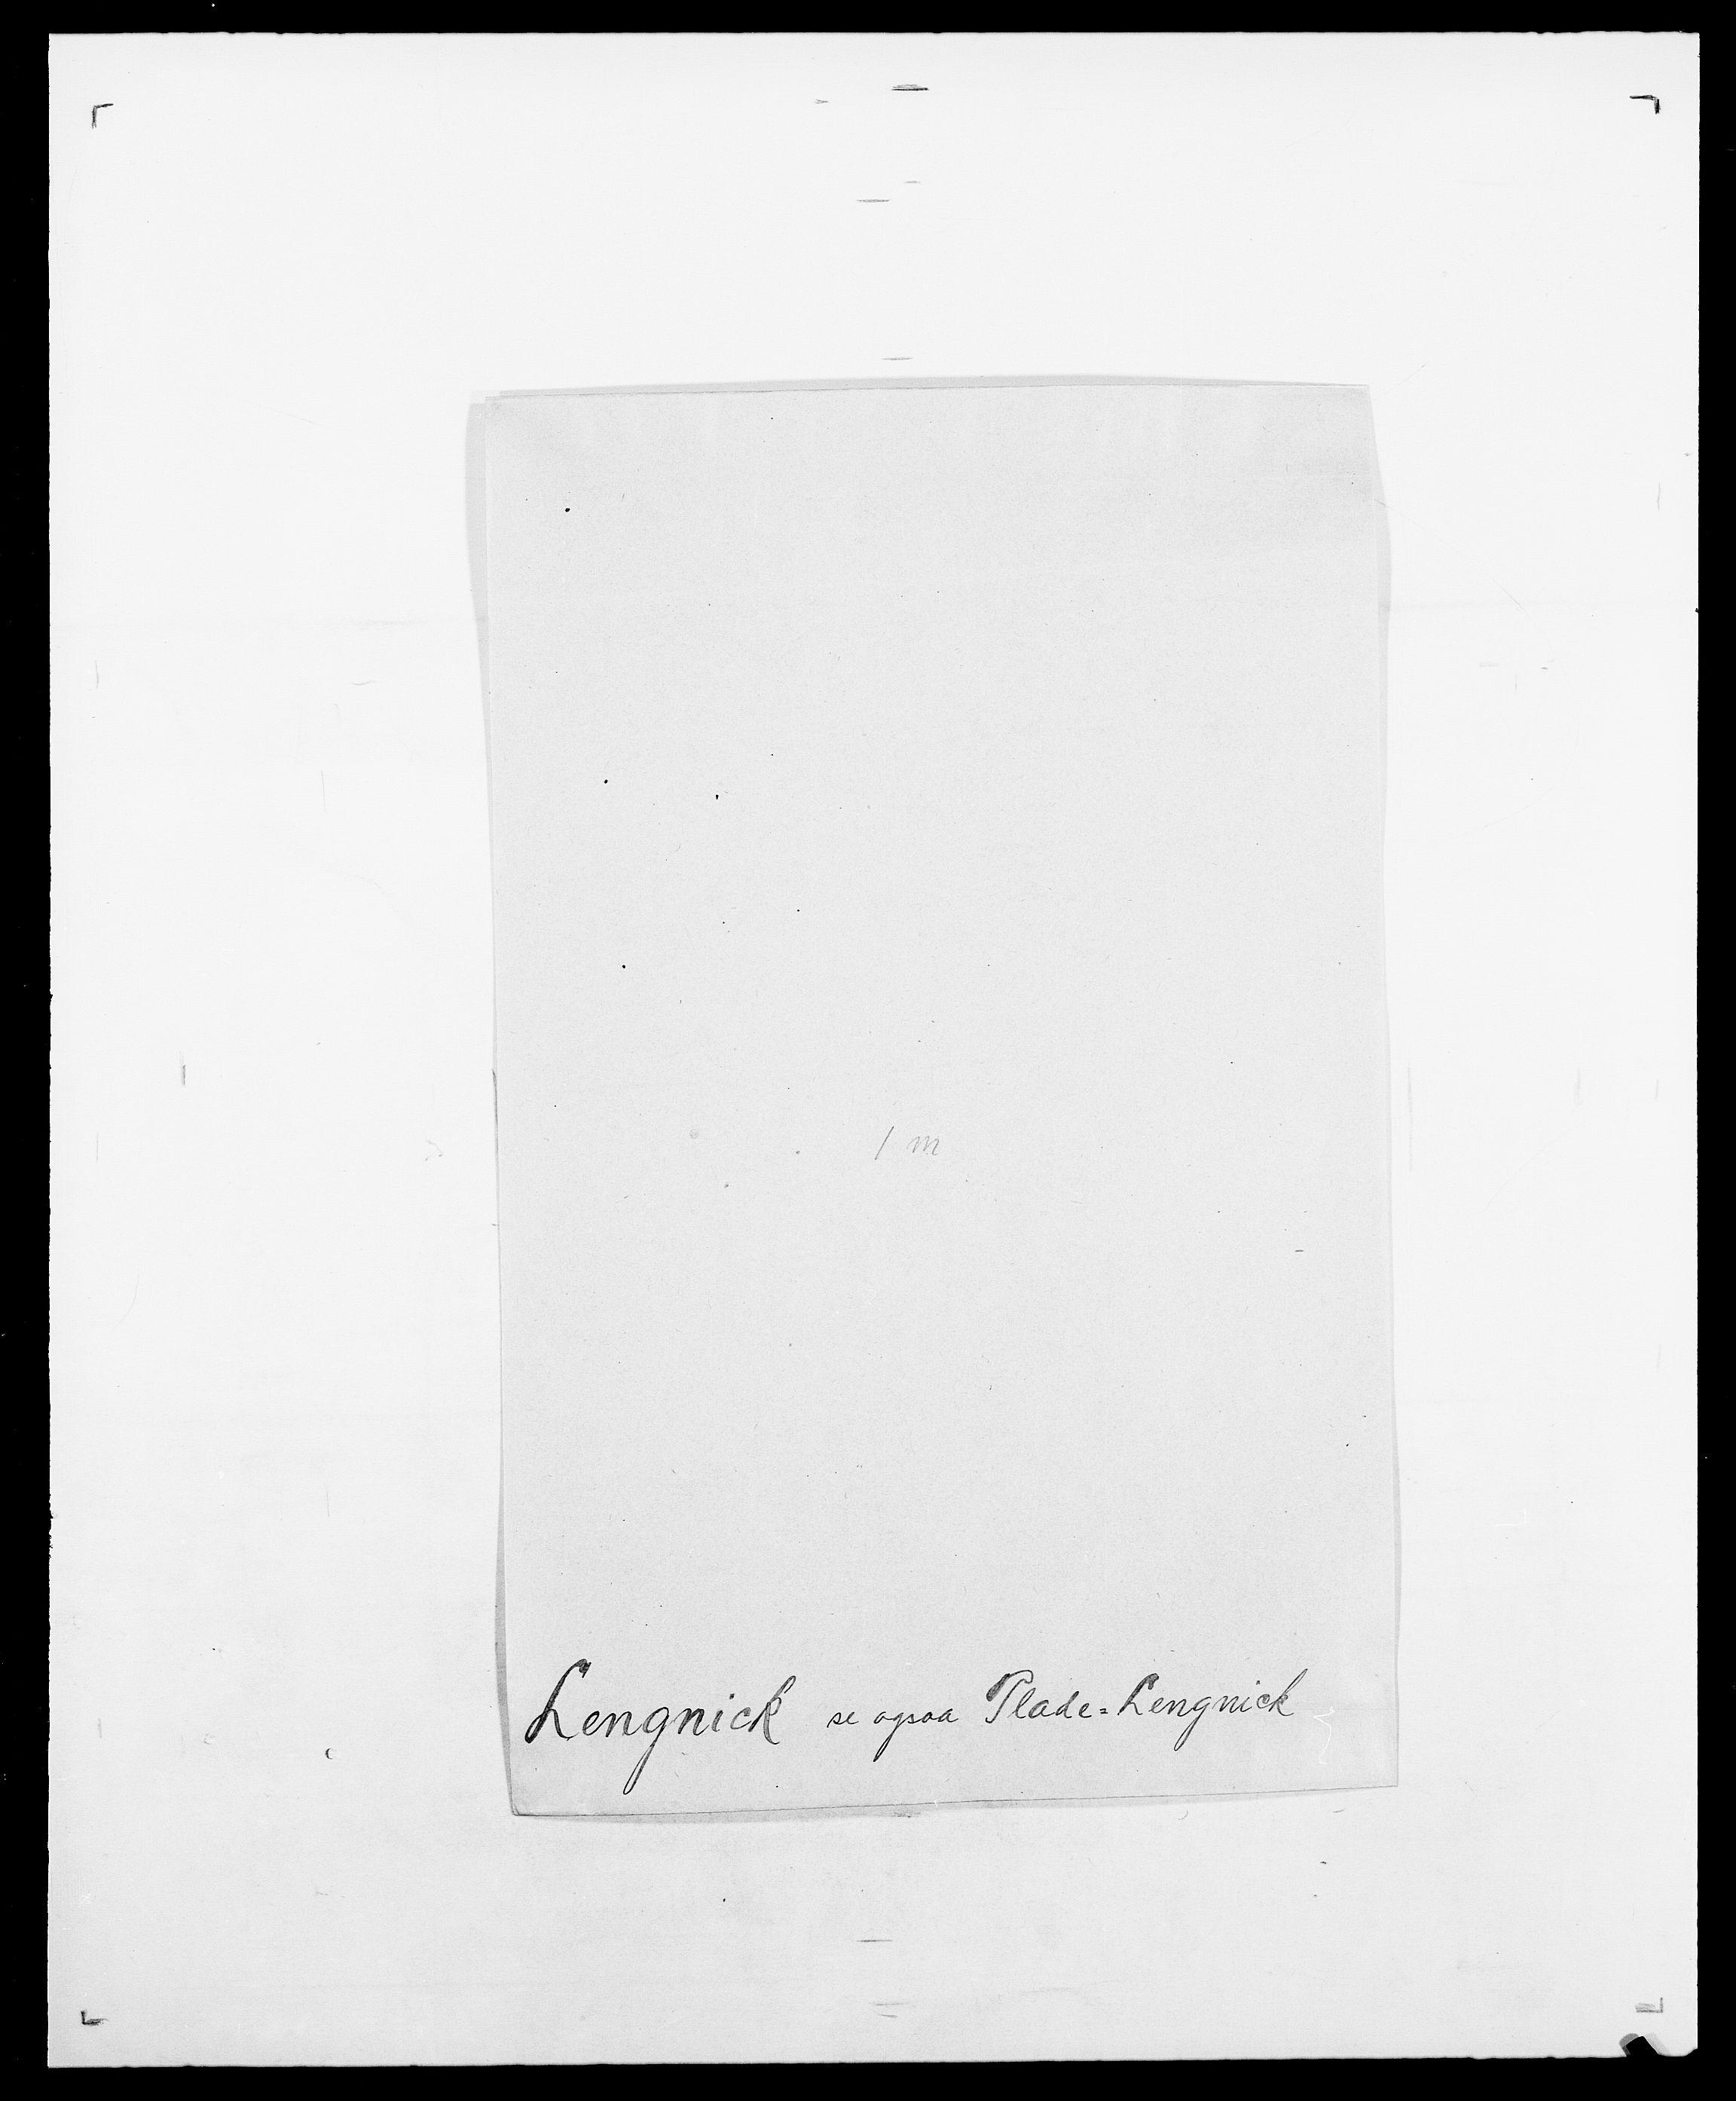 SAO, Delgobe, Charles Antoine - samling, D/Da/L0023: Lau - Lirvyn, s. 223